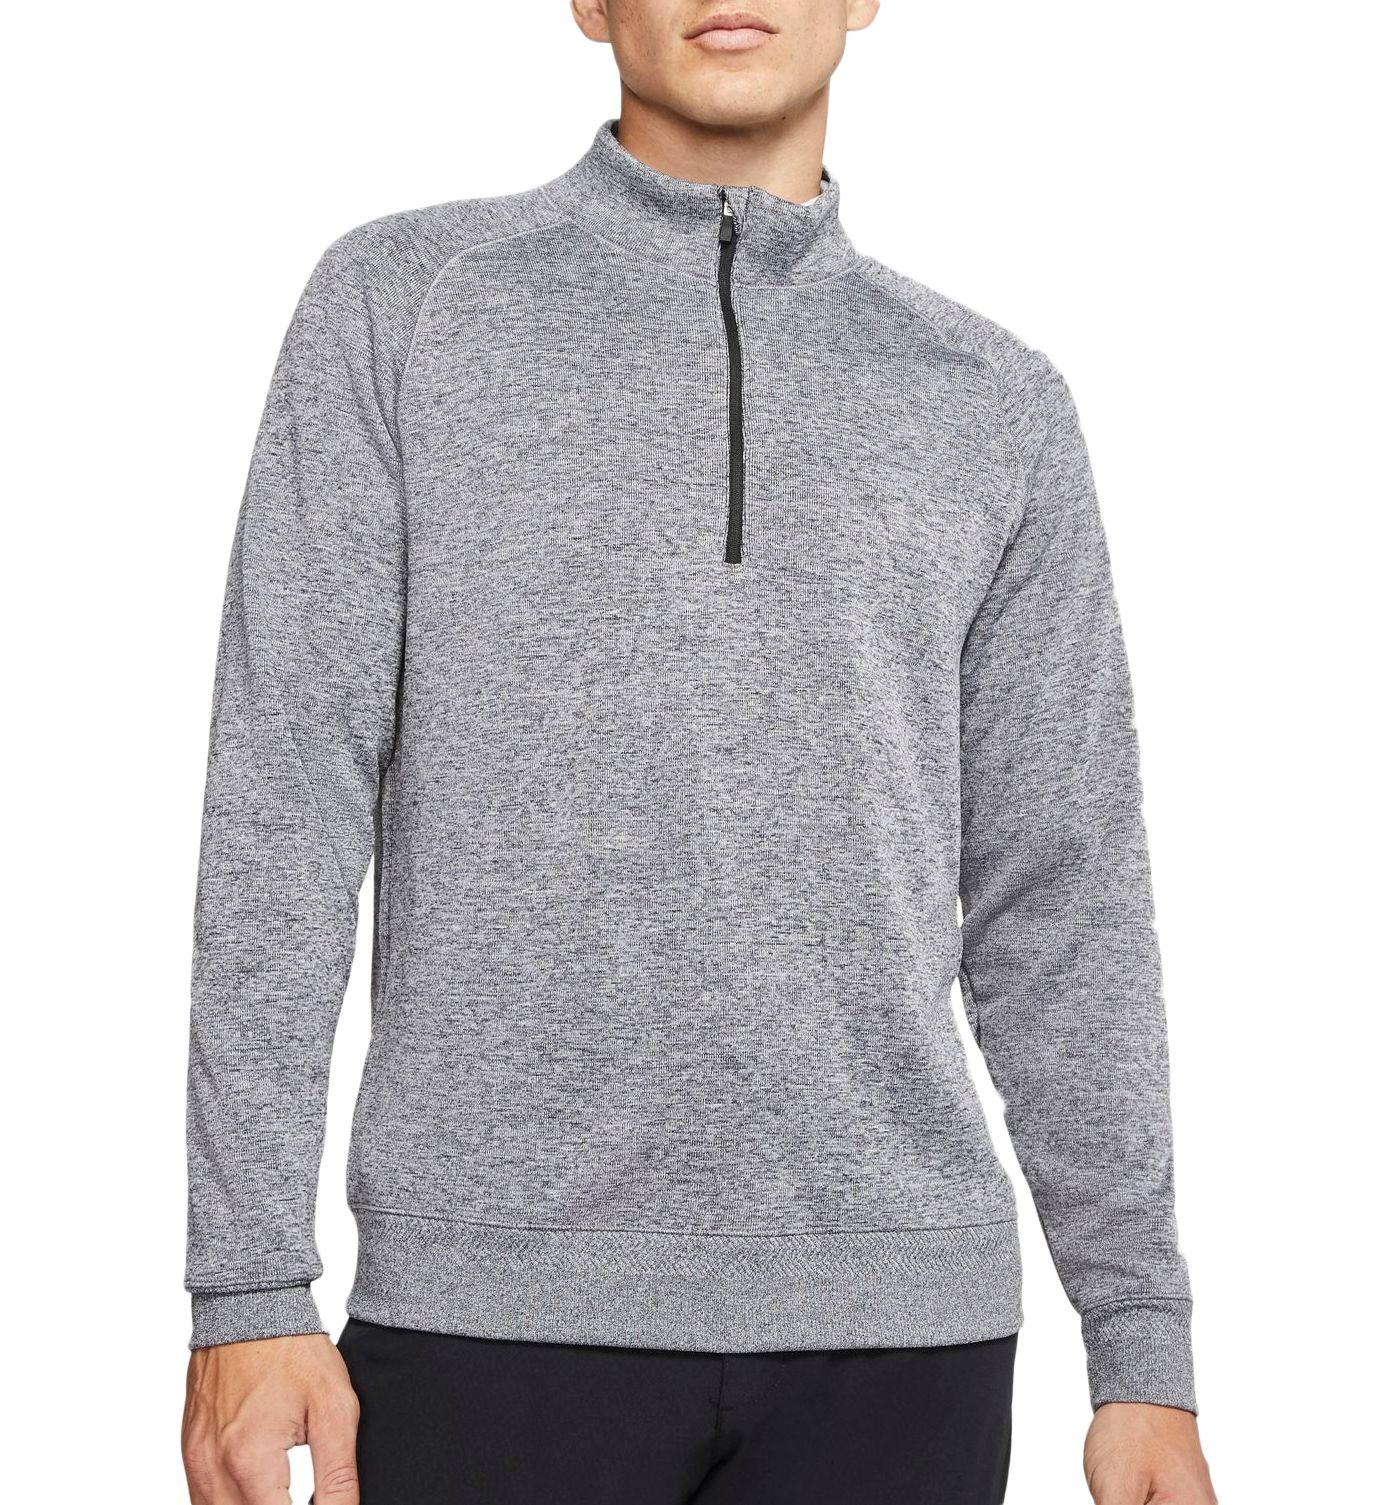 Nike Men's Dri-FIT Player ½ Zip Golf Pullover